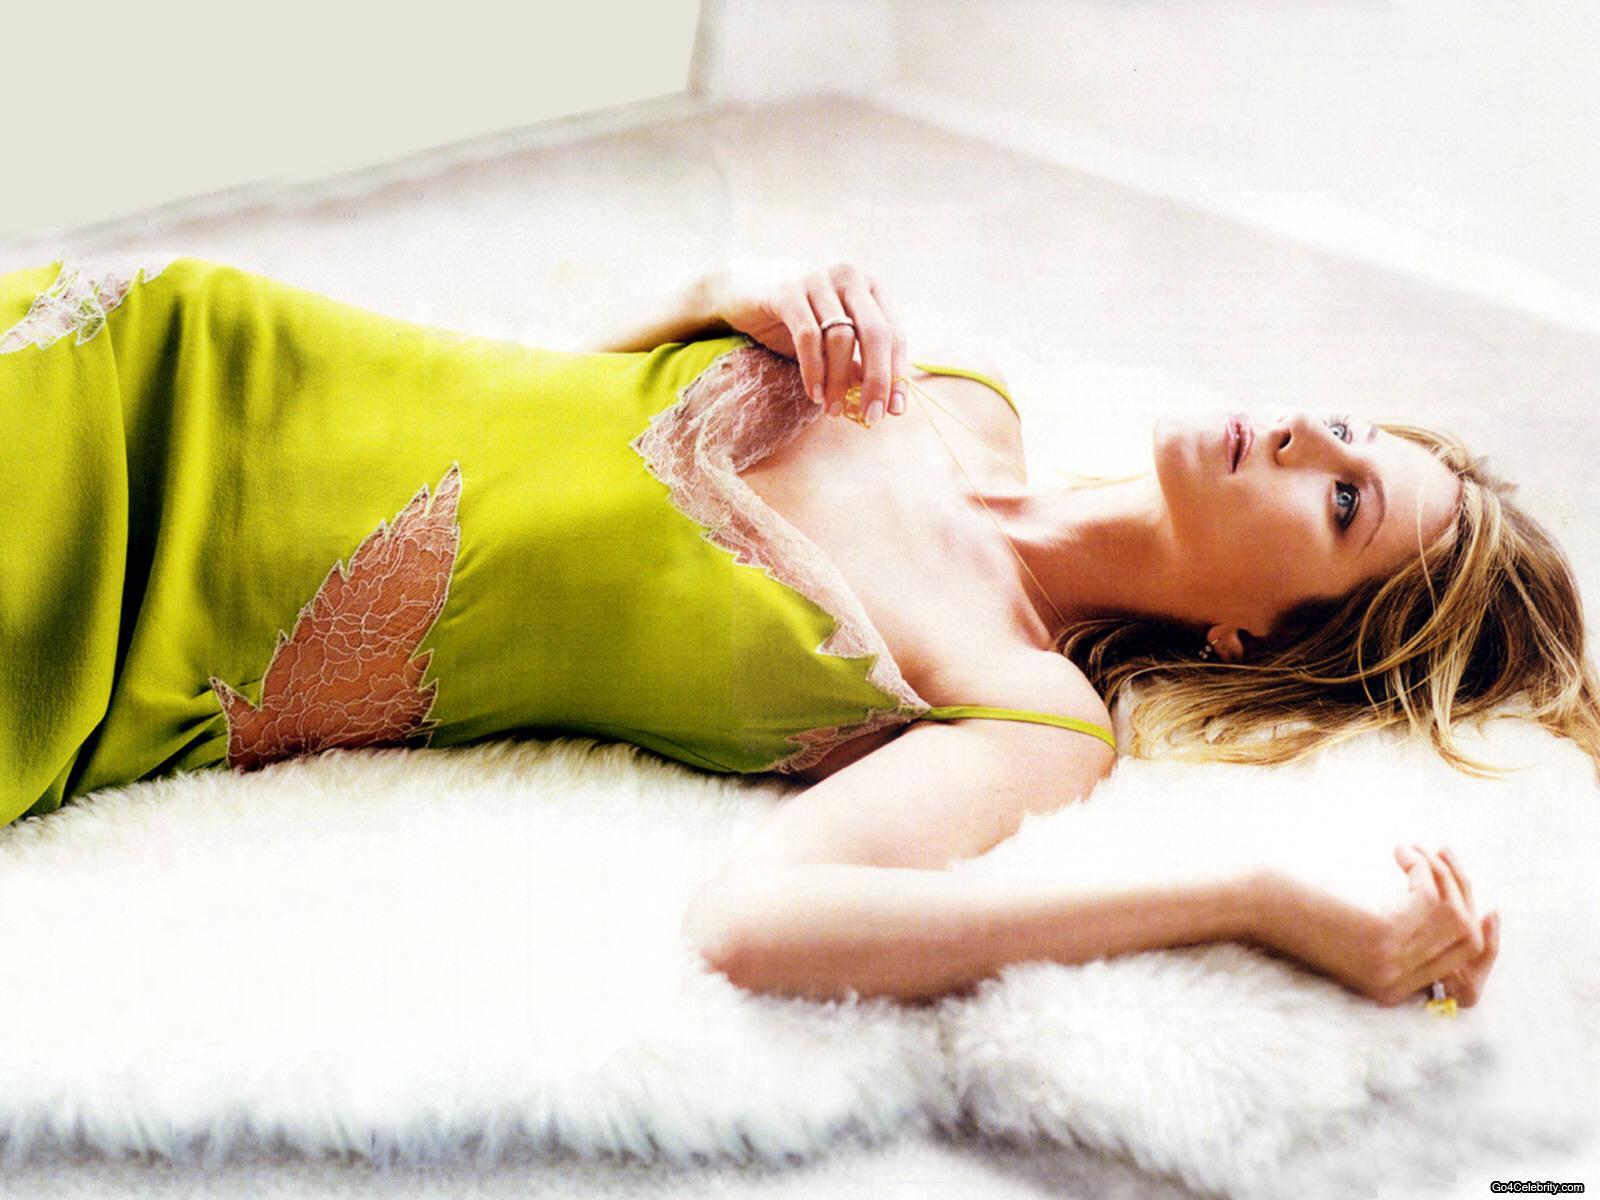 http://1.bp.blogspot.com/_CRsA2fUP4Ys/SxUomcpIdhI/AAAAAAAAB50/y85suF4iZYE/s1600/Jennifer+Aniston+4.jpg